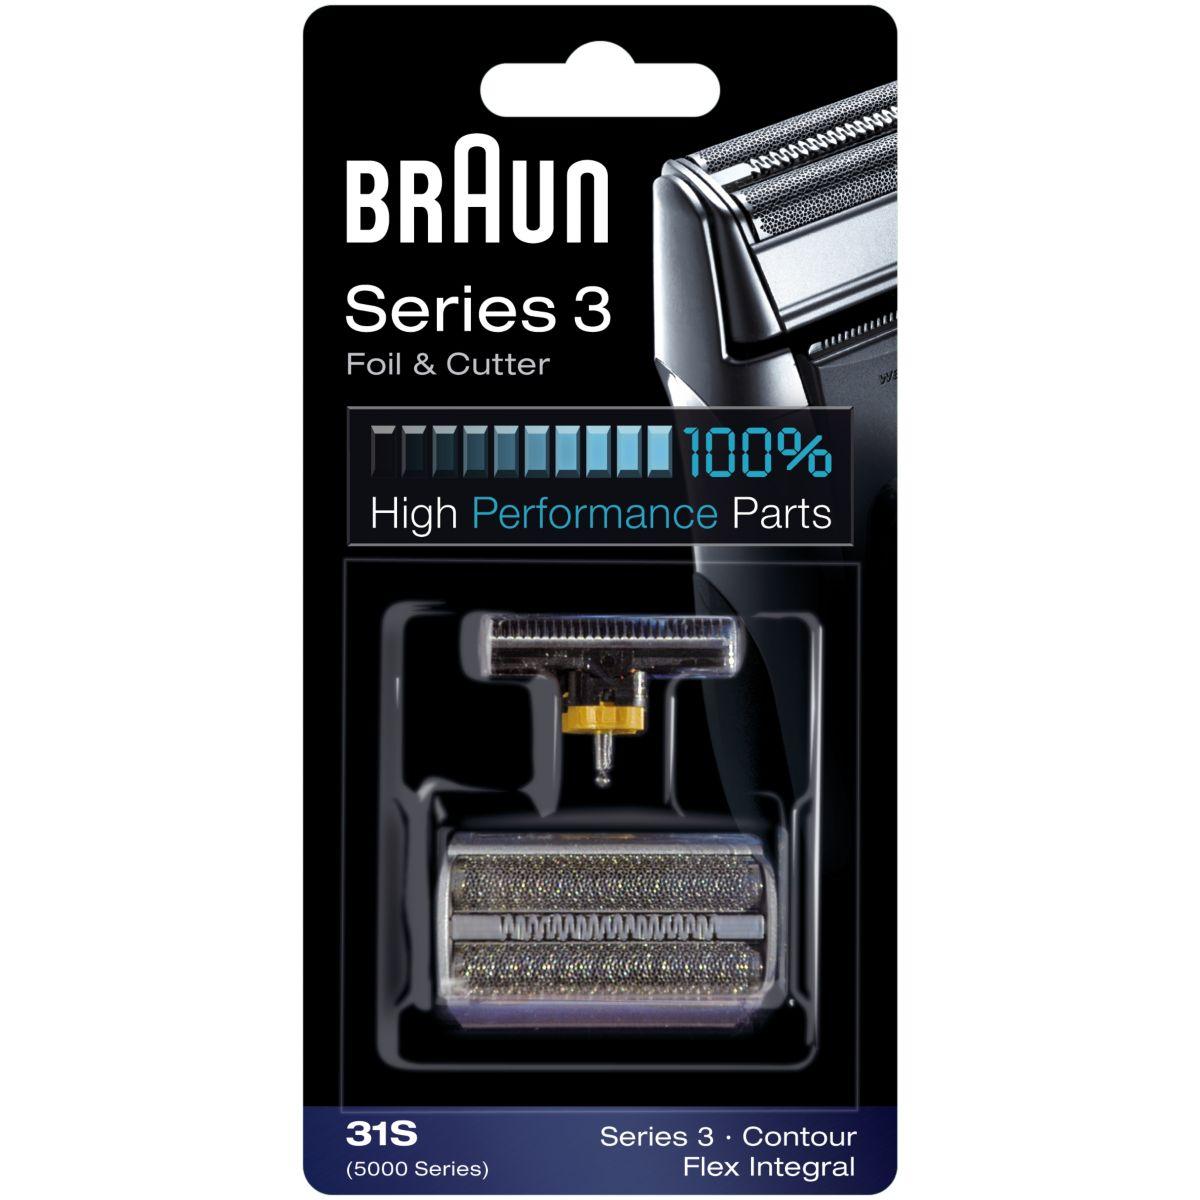 Pack BRAUN 31S serie 3